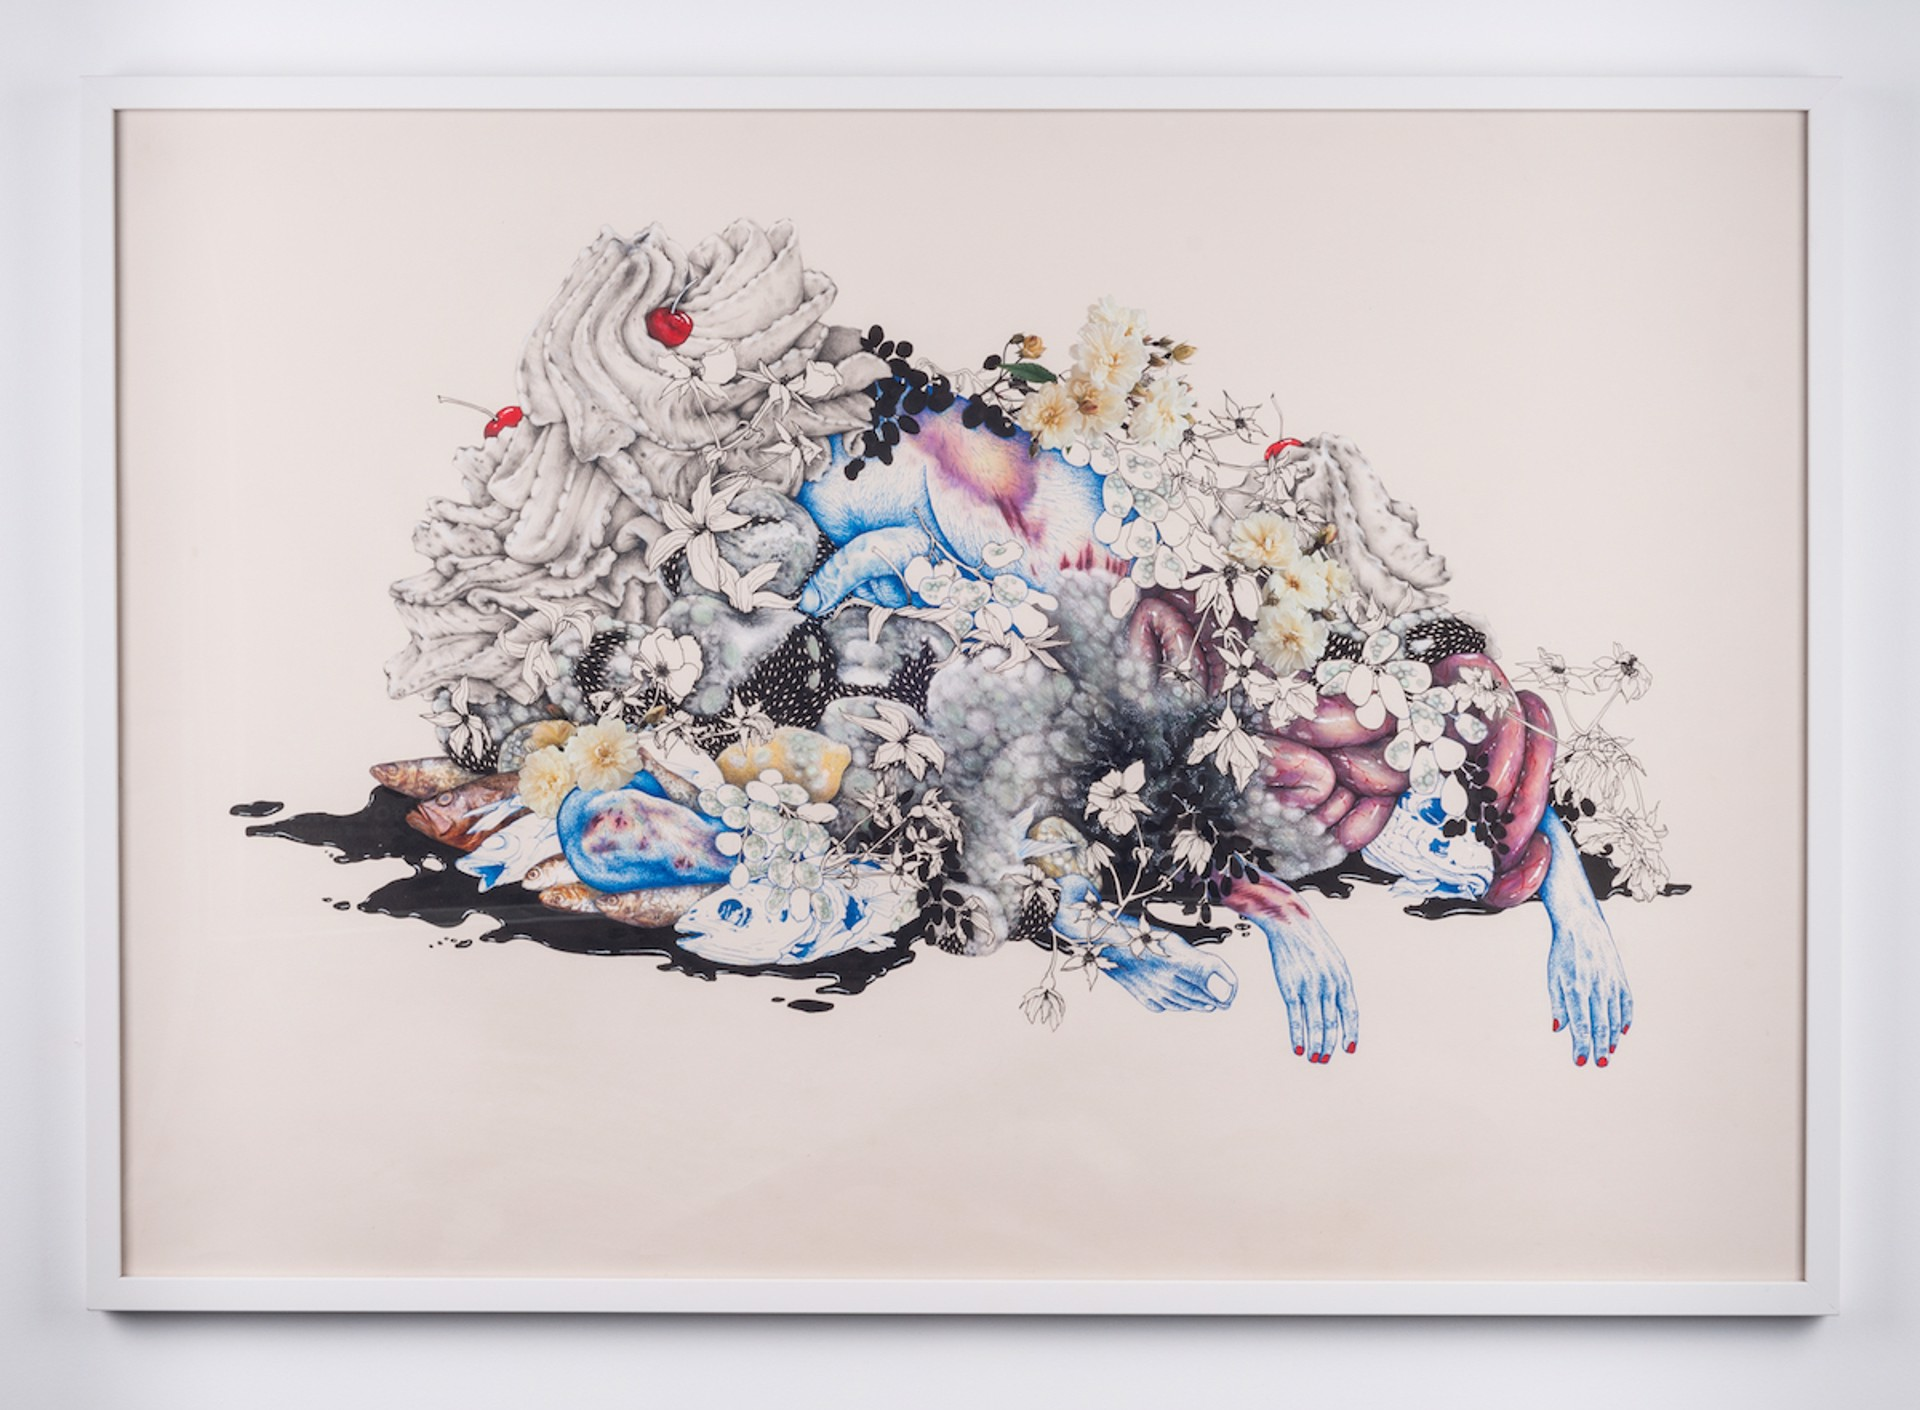 Vanita by Morgan Rosskopf